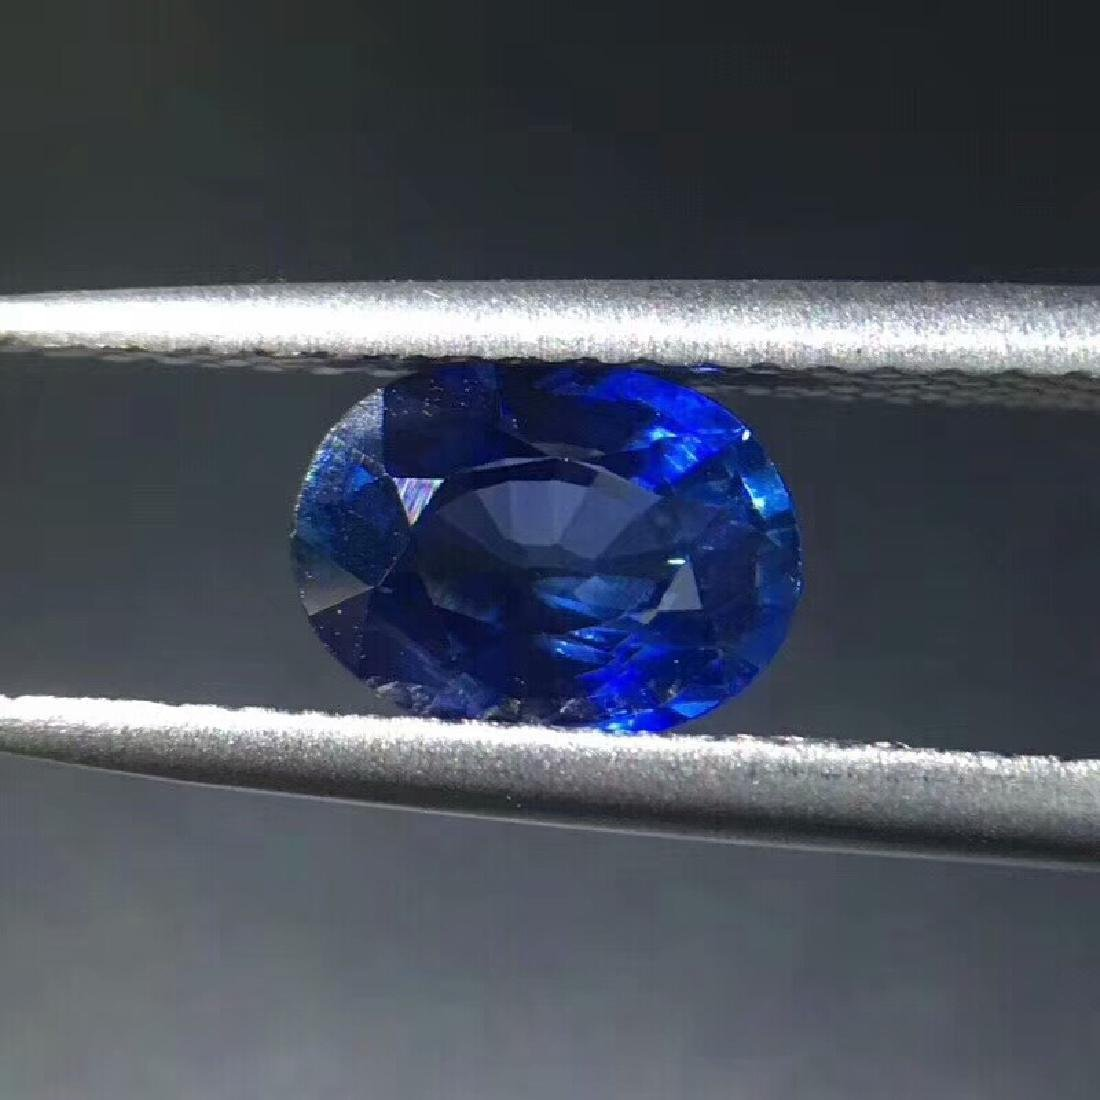 1.3 ct Sapphire 7.2*5.9*3.7 mm Oval Cut